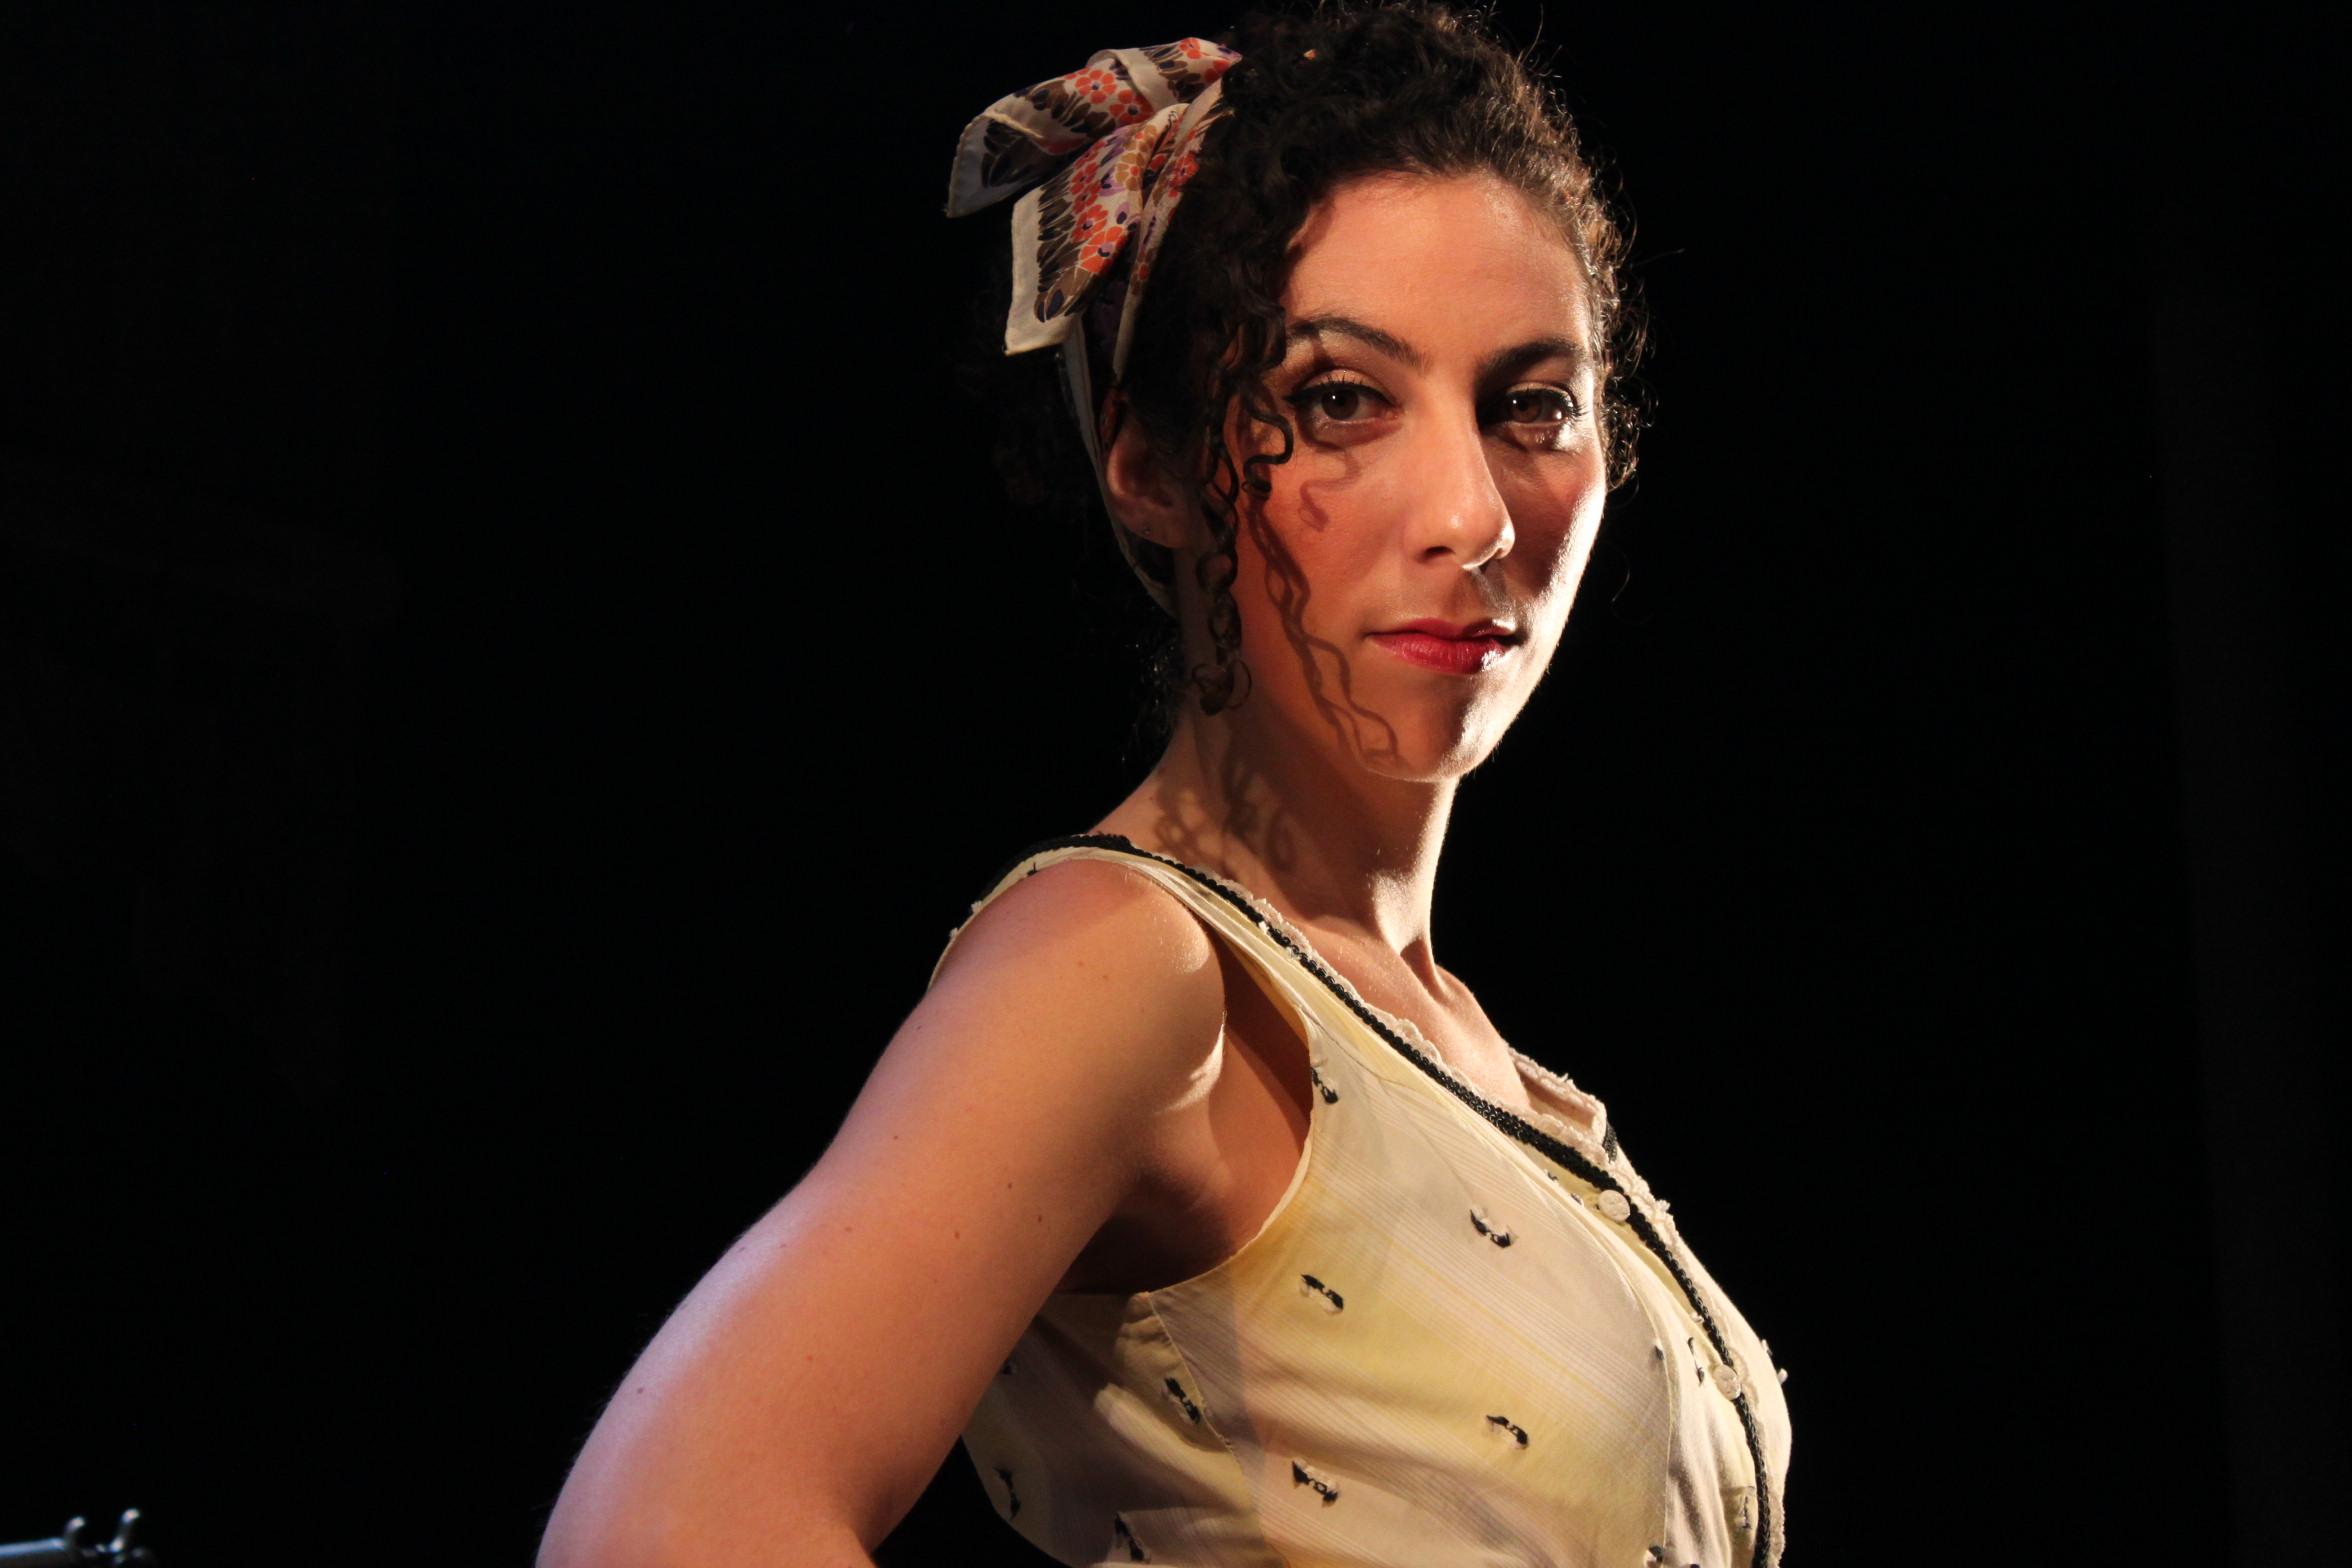 Rimers of Eldritch , Cora Groves, Directed by: Rose Bonczek